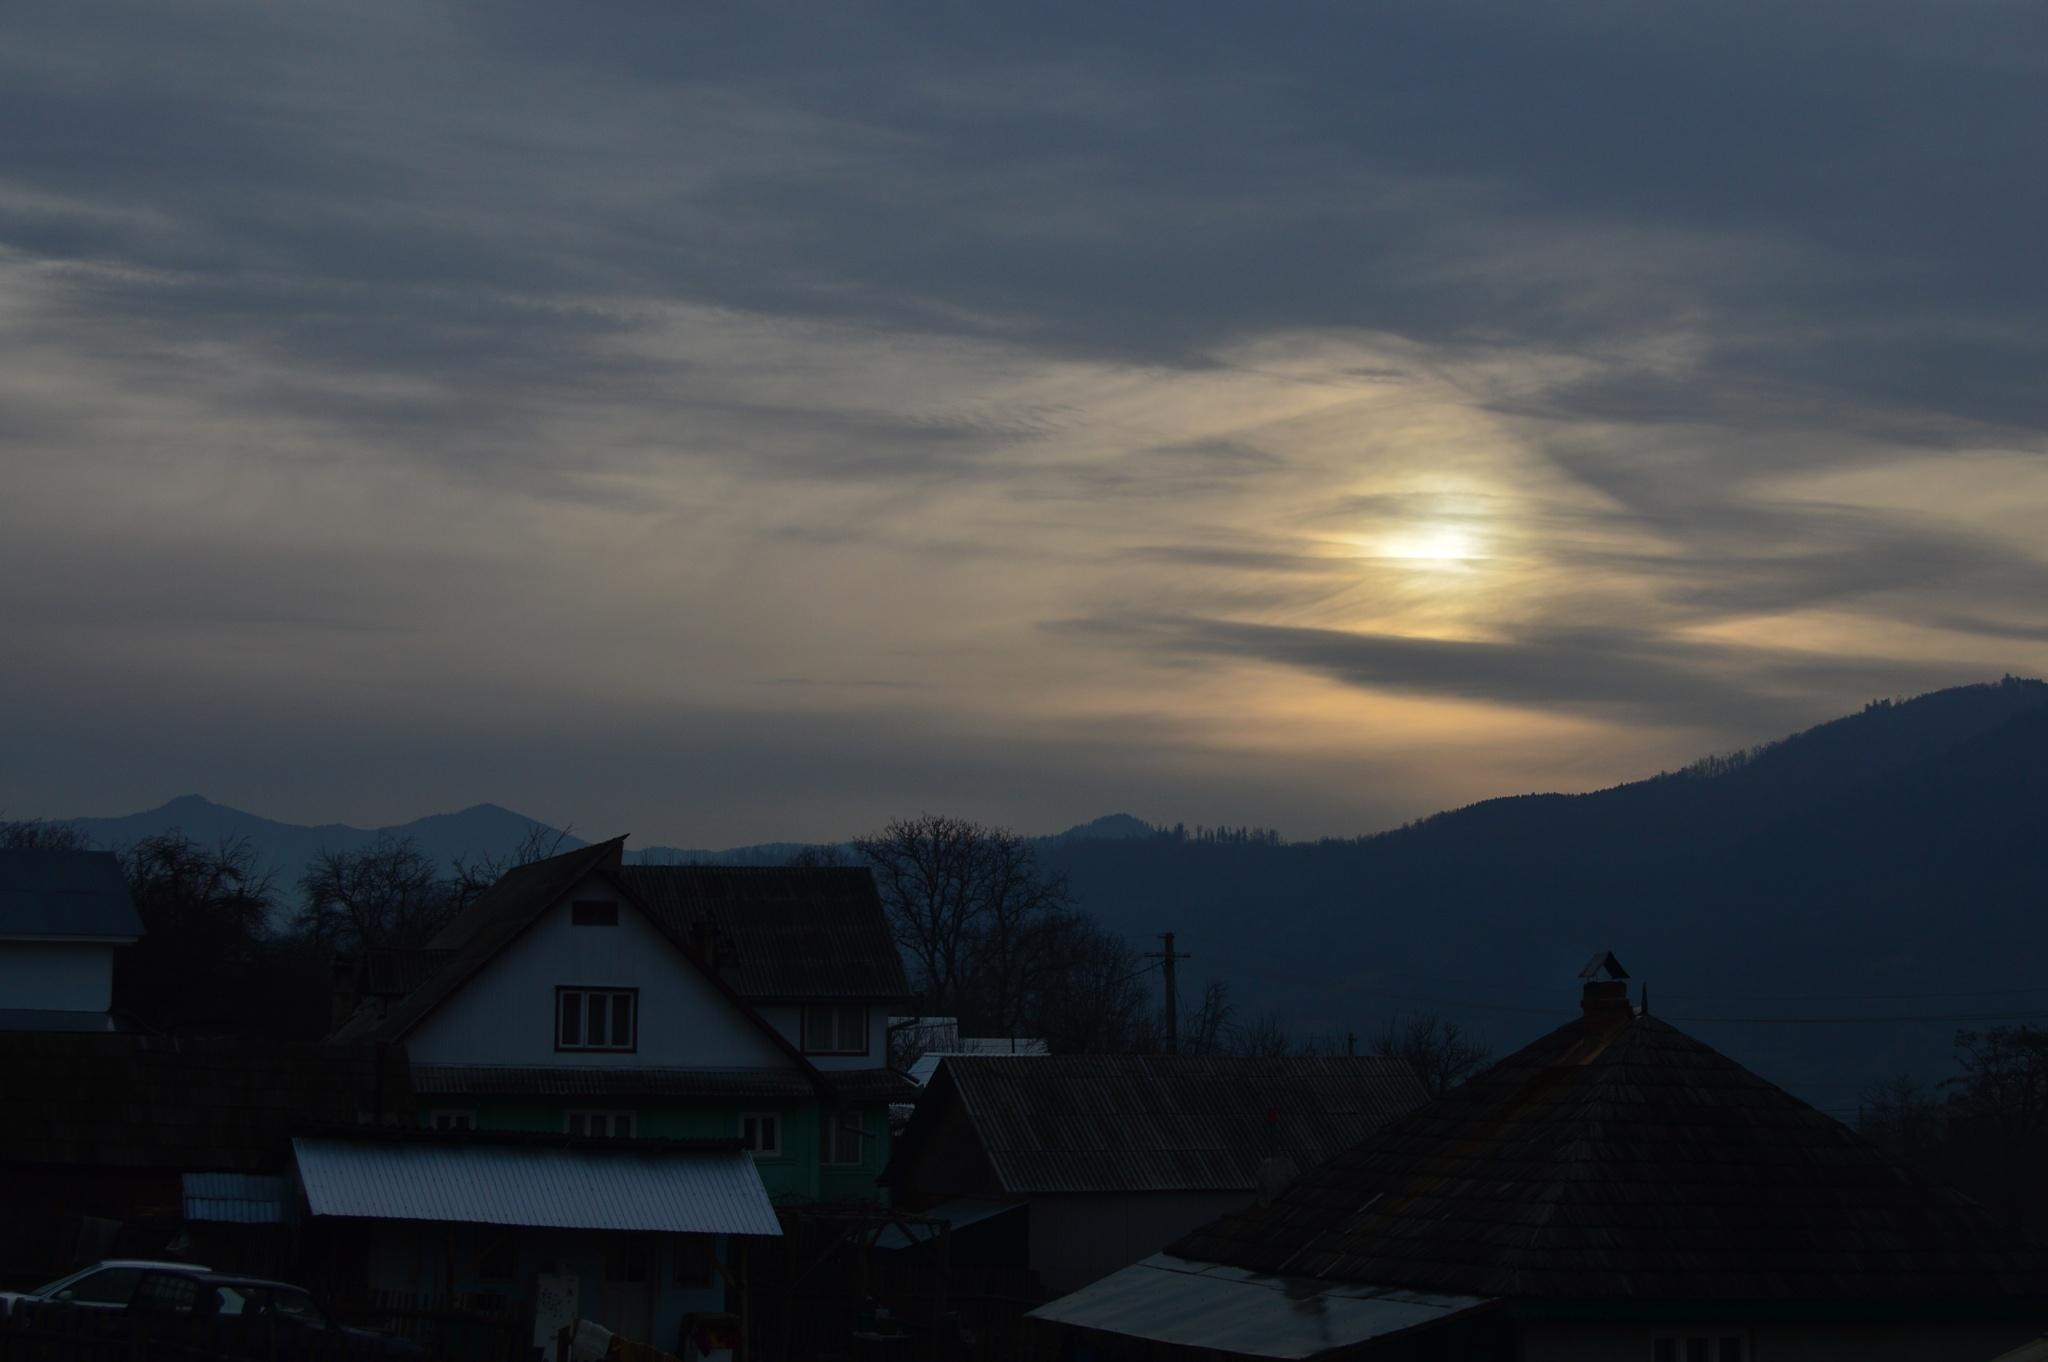 sunset by Mădălina